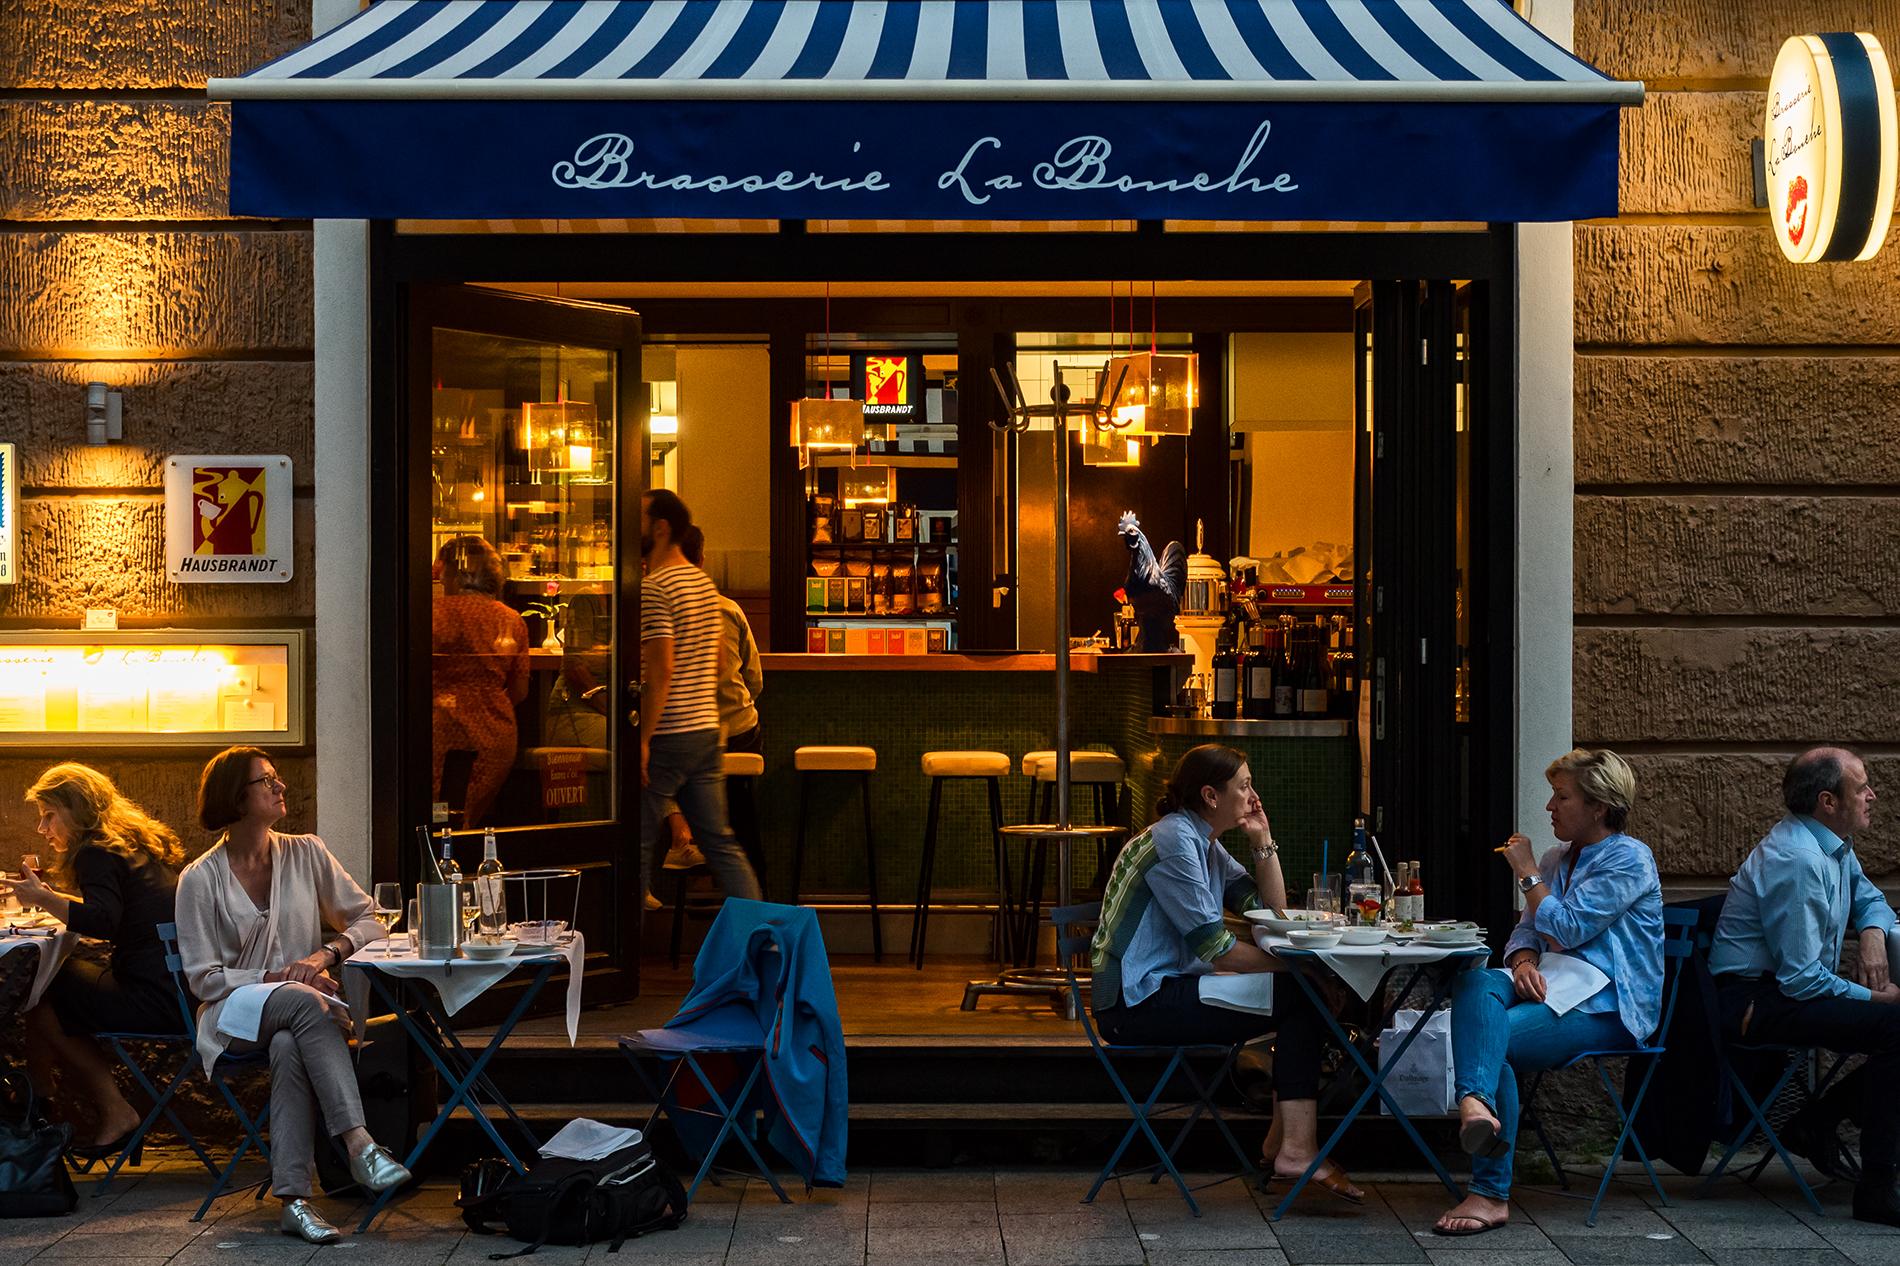 Brasserie La Bouche in München